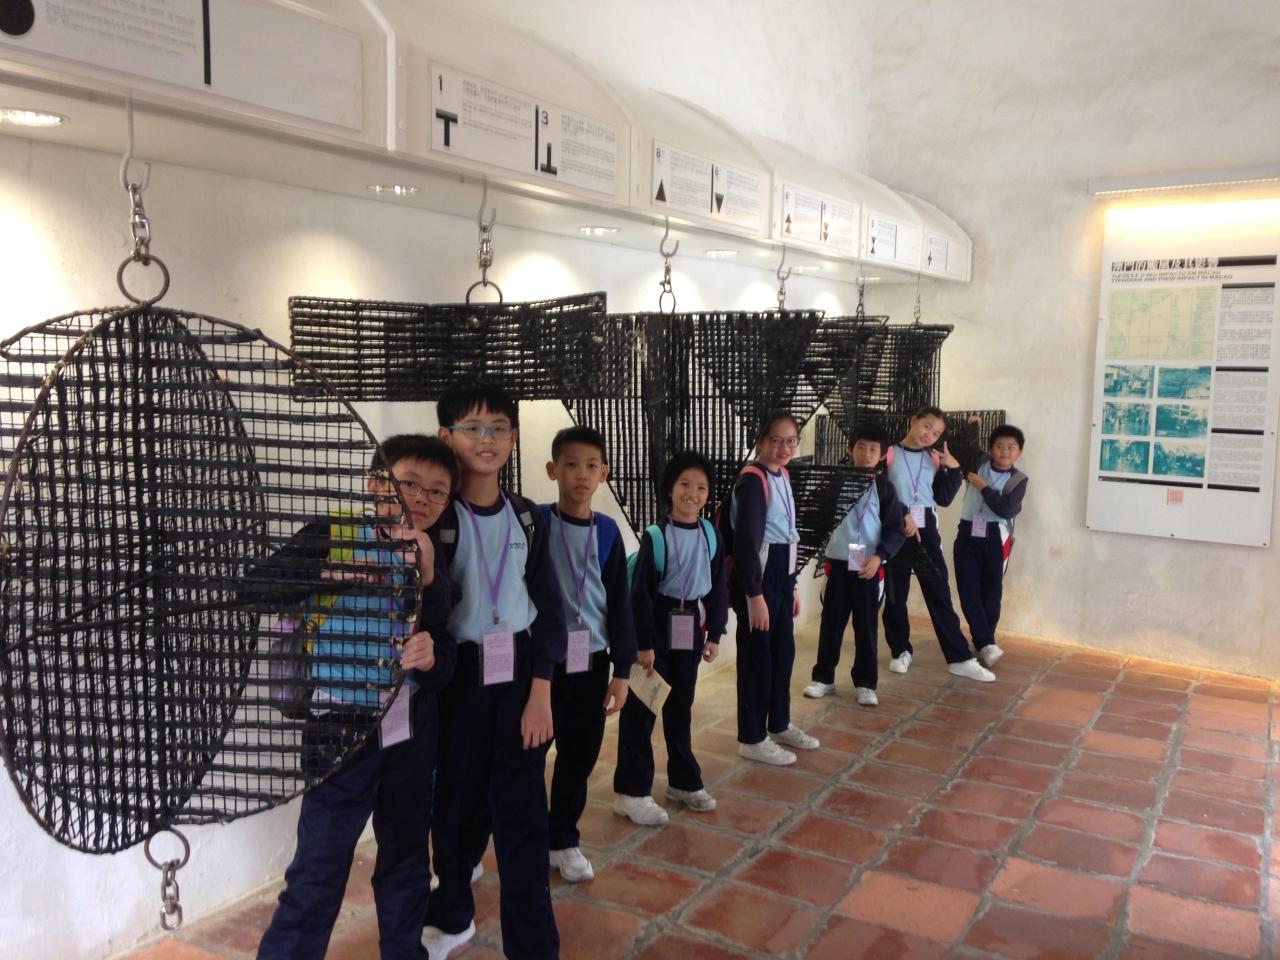 http://keito.school.hk/sites/default/files/batch_img_2997.jpg